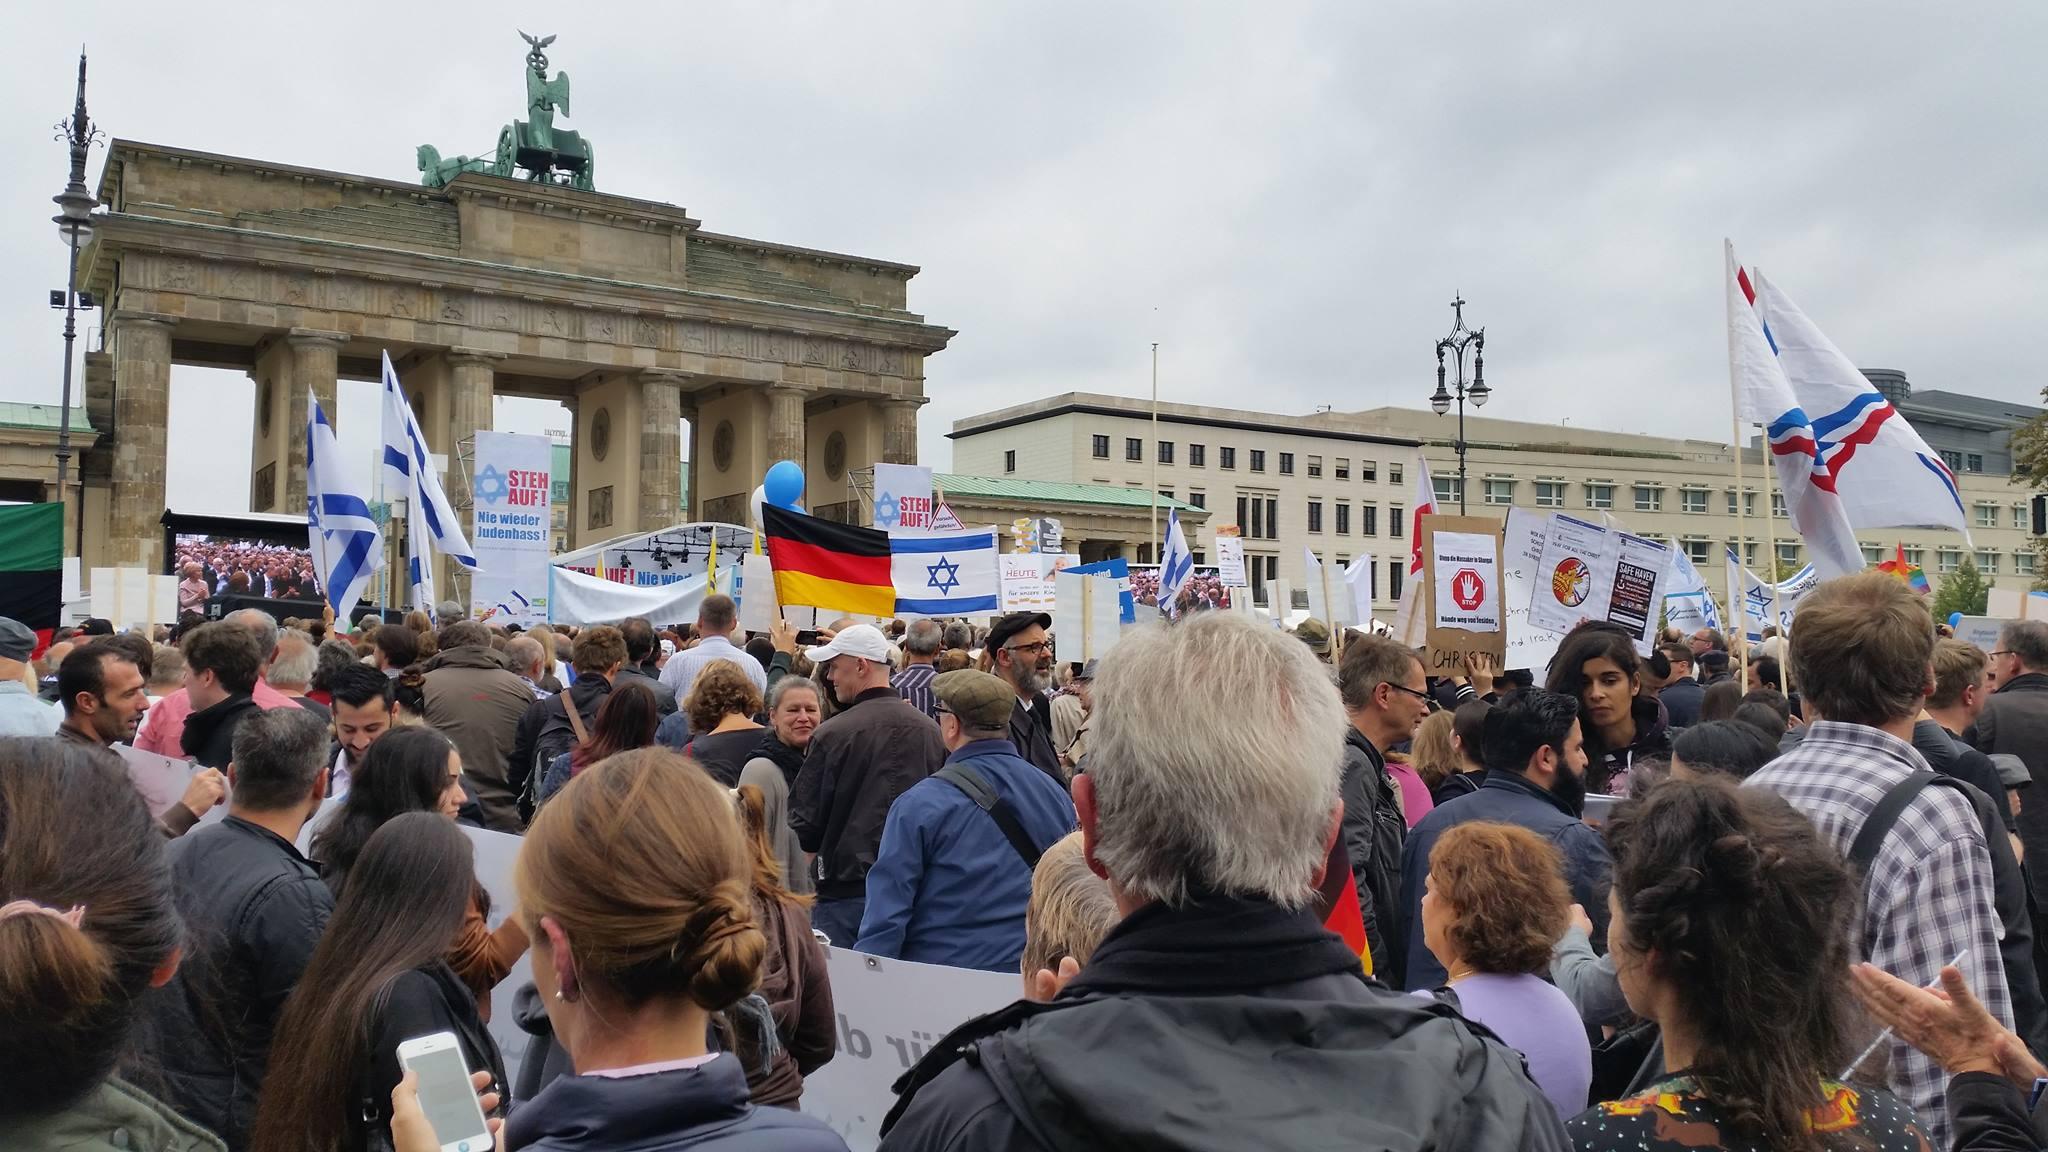 Kundgebung gegen Judenfeindschaft am 14.09.2014 vor dem Brandenburger Tor in Berlin